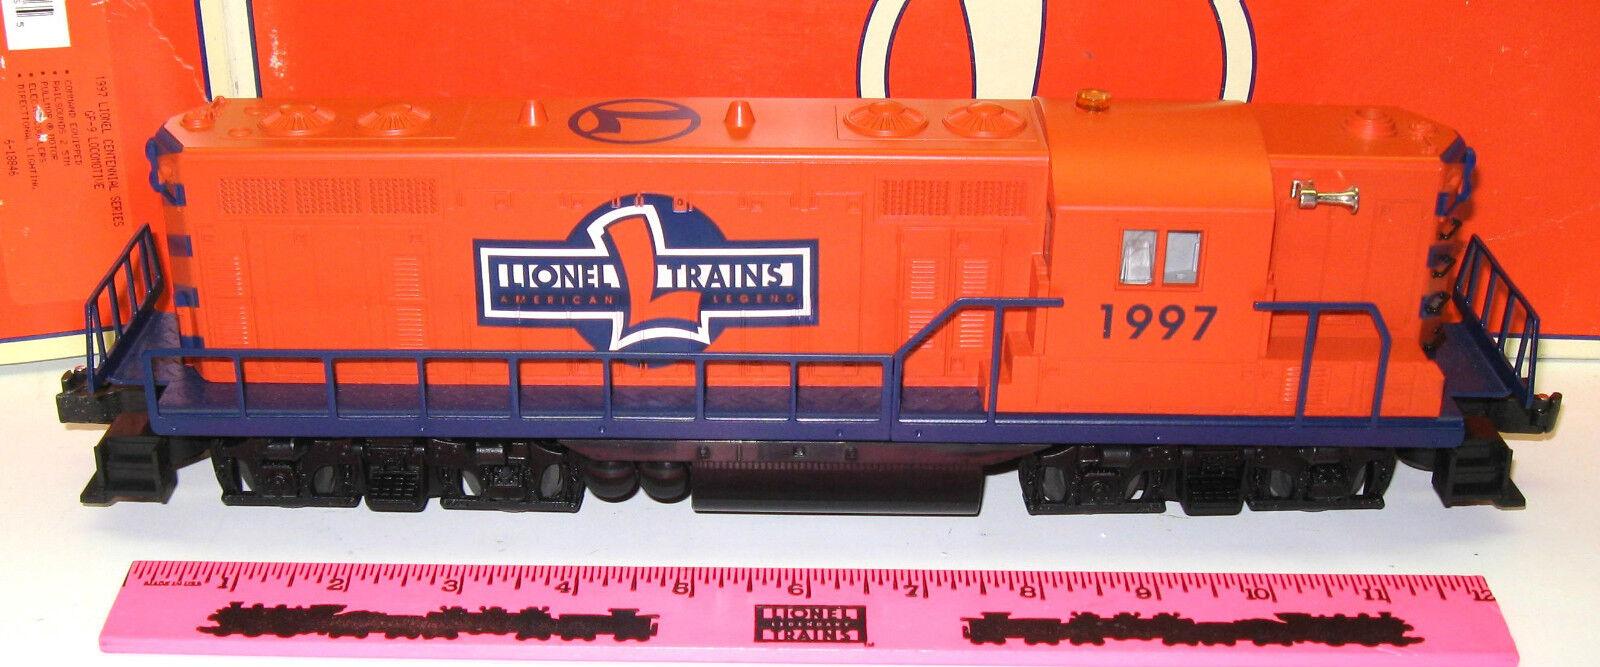 Lionel 6-18846 6-18846 6-18846 1997 Lionel Centennial Series GP-9 Locomotive a14384